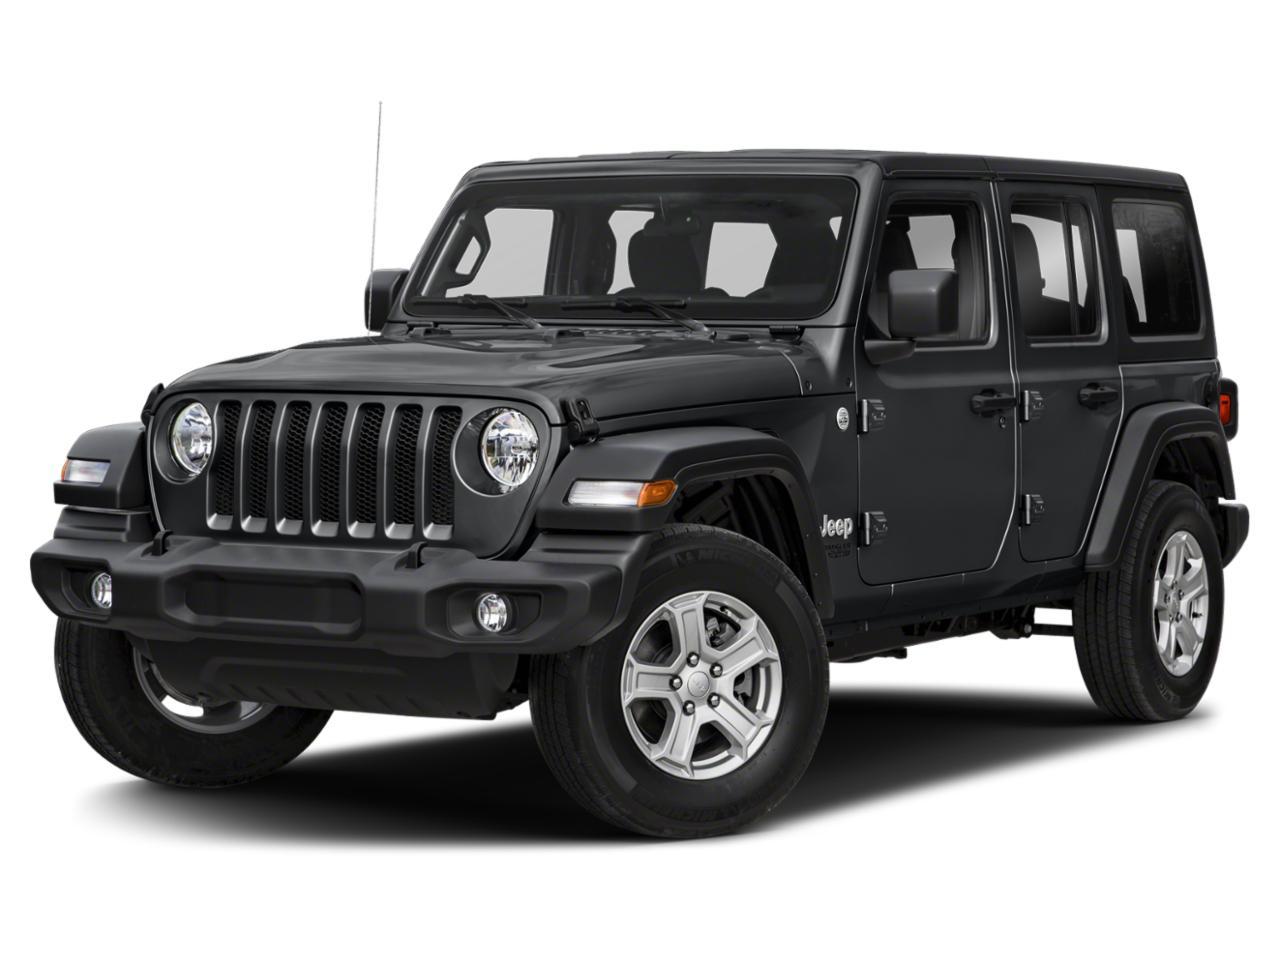 2020 Jeep Wrangler Unlimited Vehicle Photo in Jasper, GA 30143